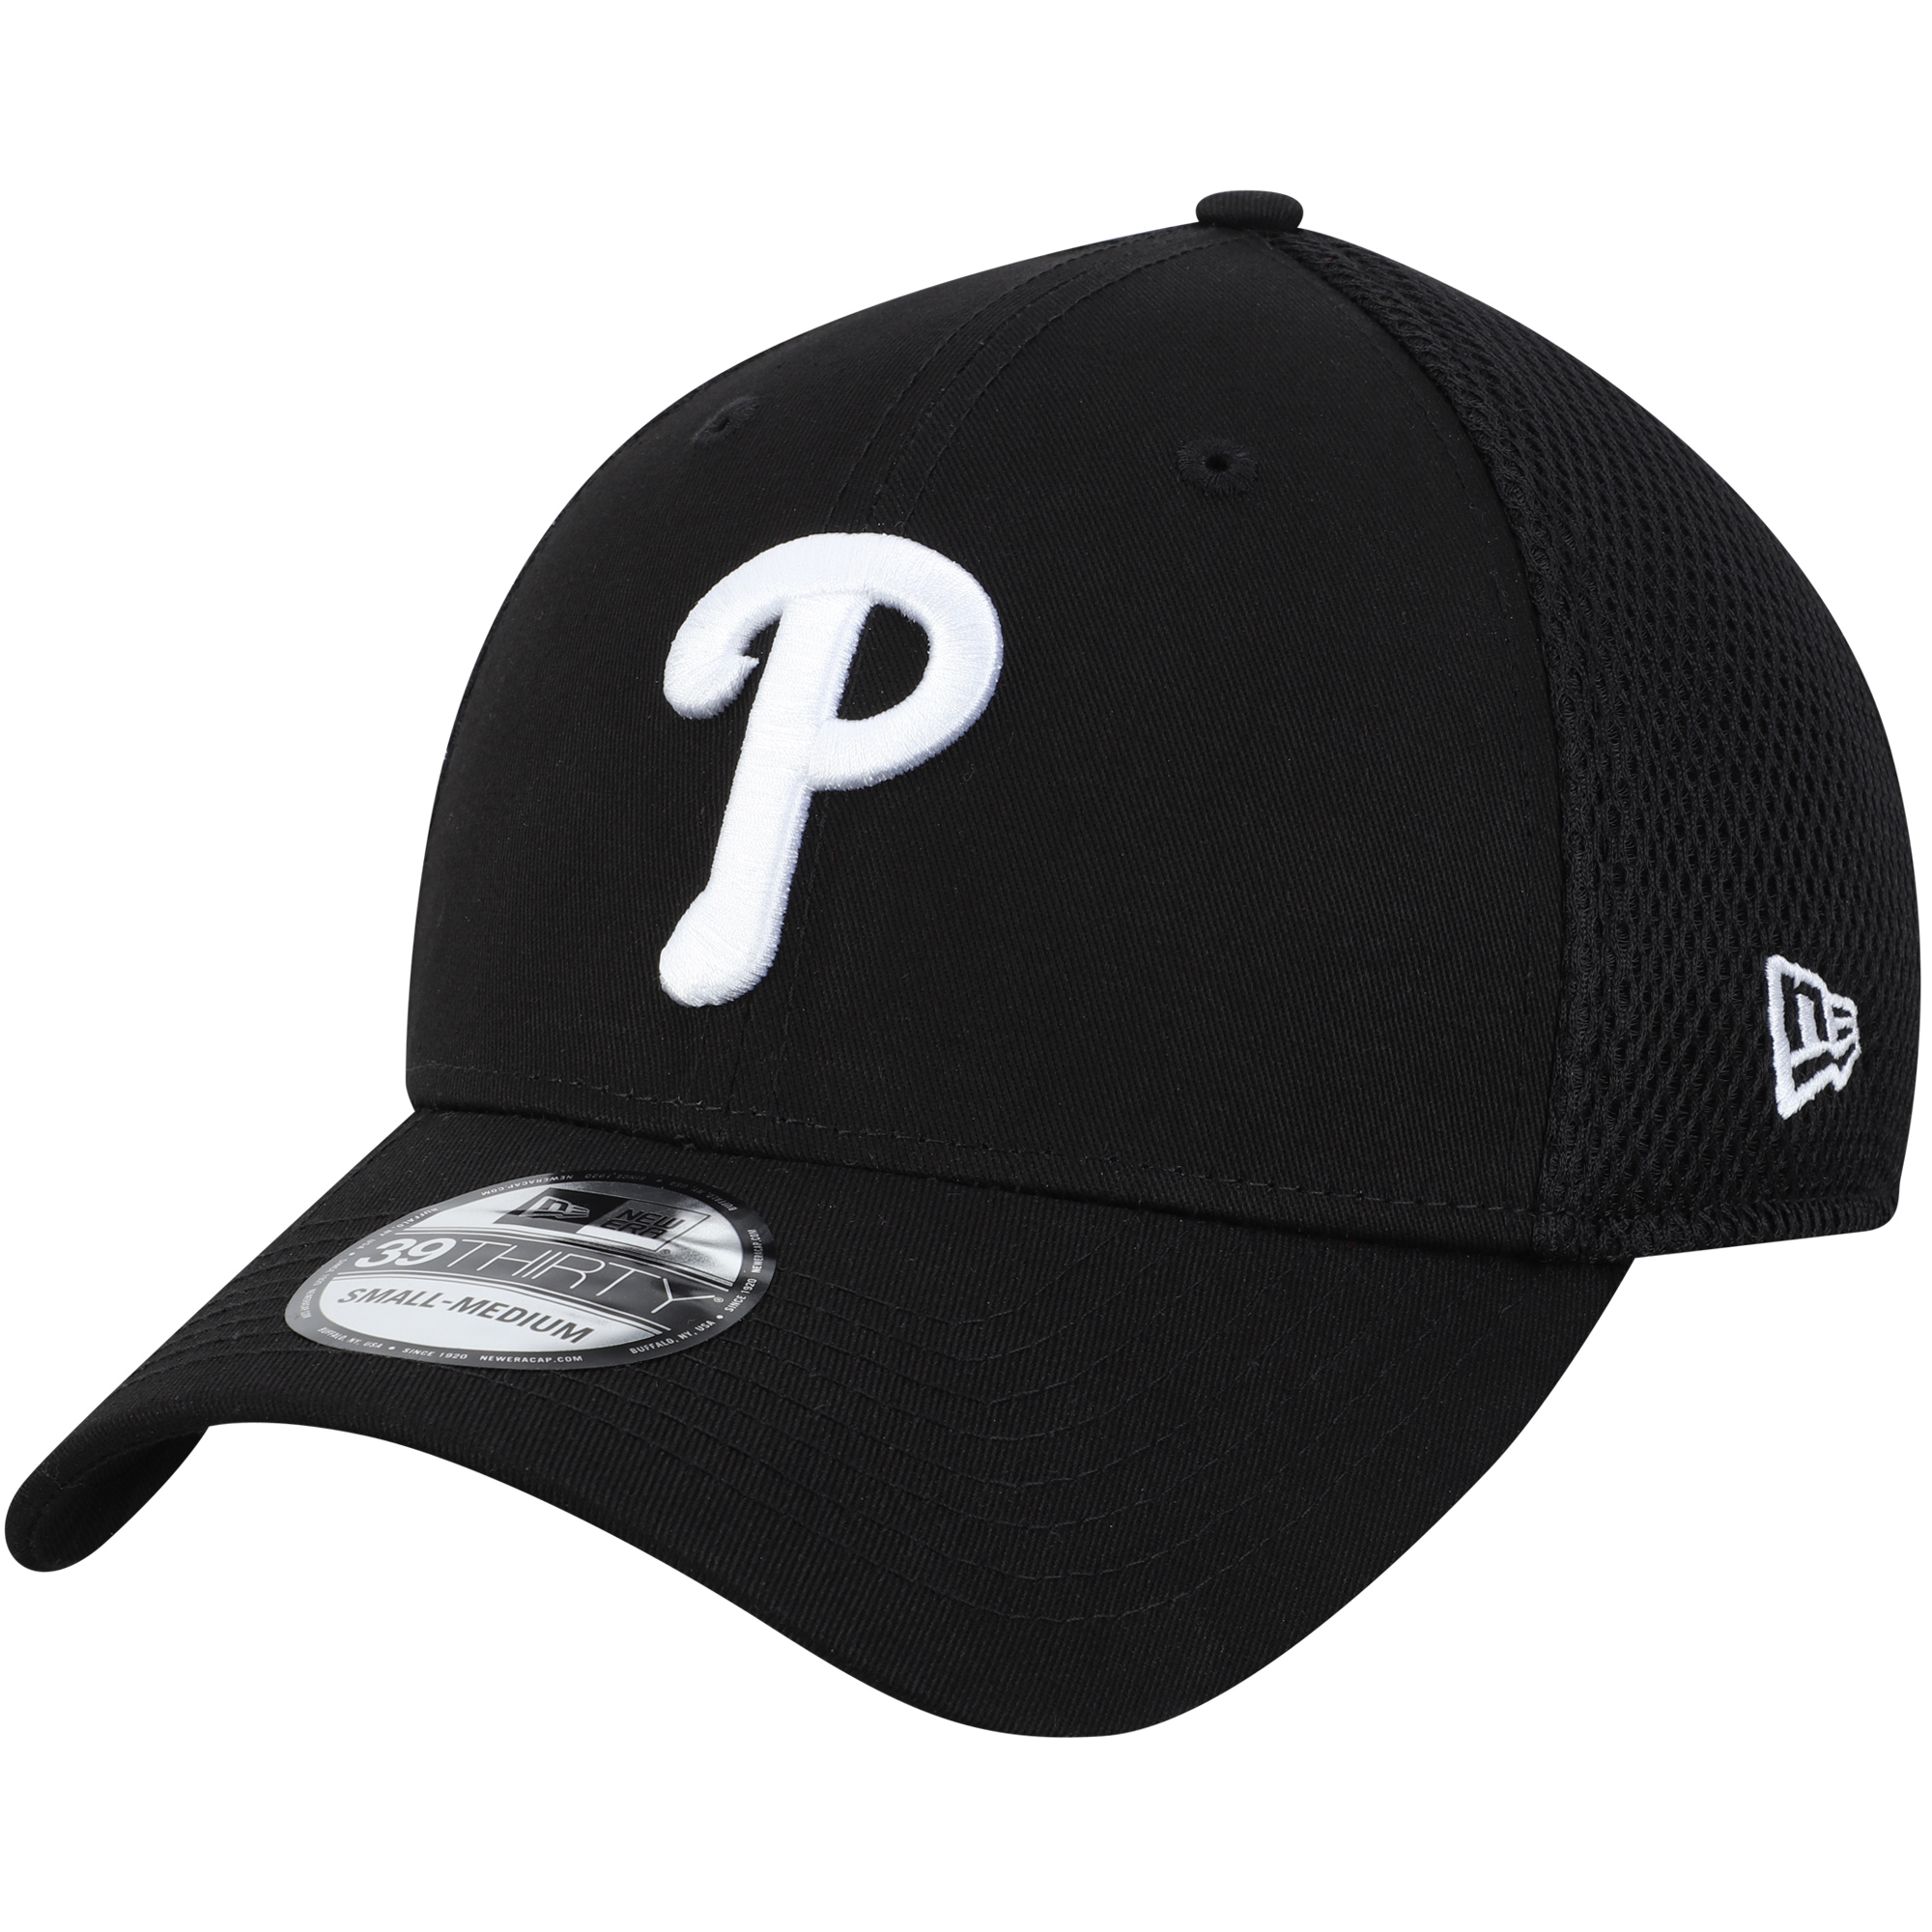 Philadelphia Phillies New Era Team Neo 39THIRTY Unstructured Flex Hat - Black